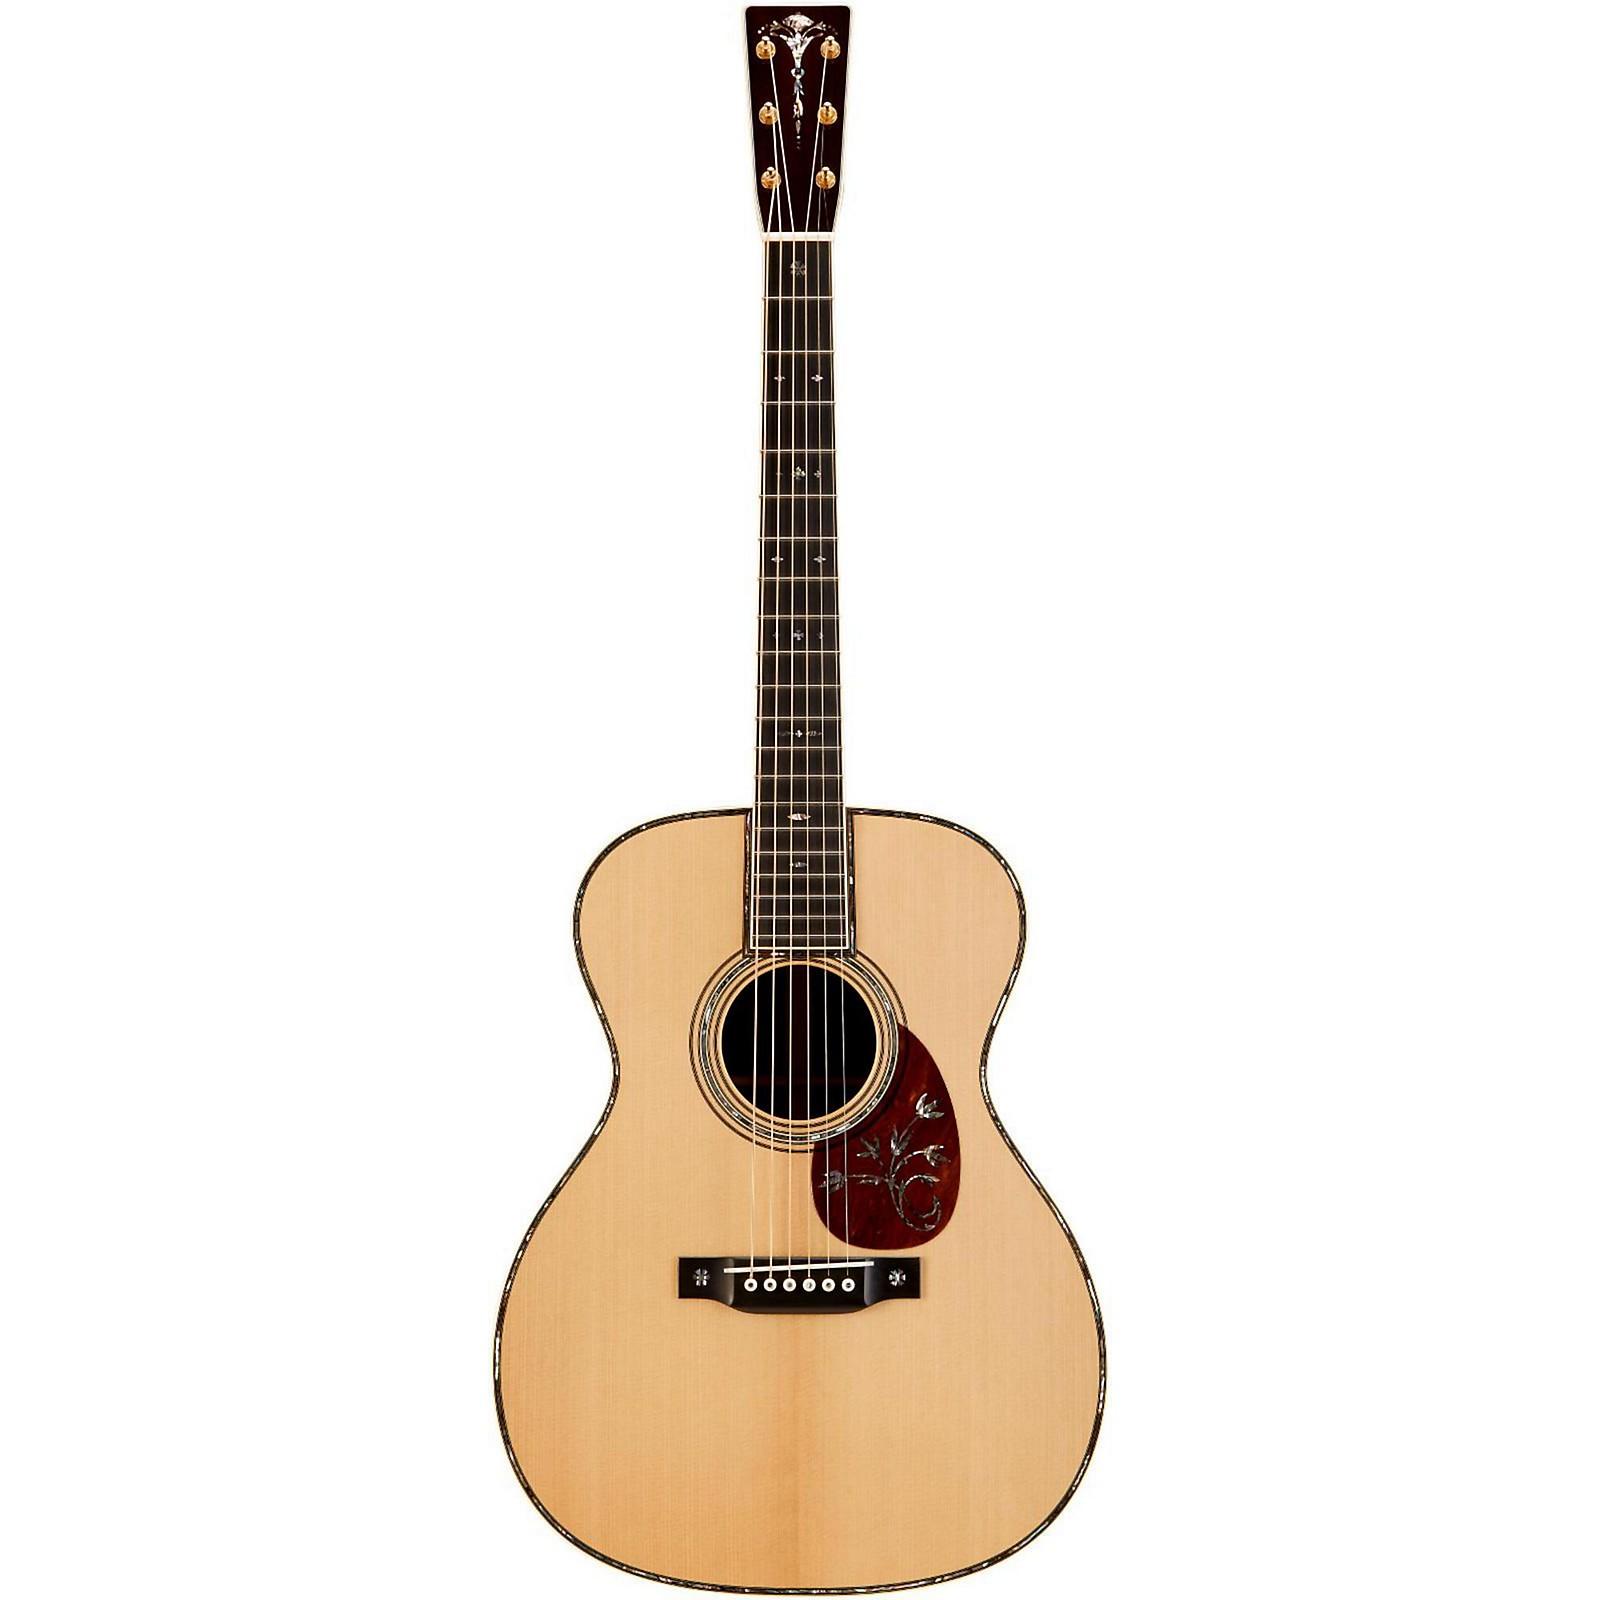 Brazilian Rosewood Acoustic Guitar Plectrum String Instrument Accessory